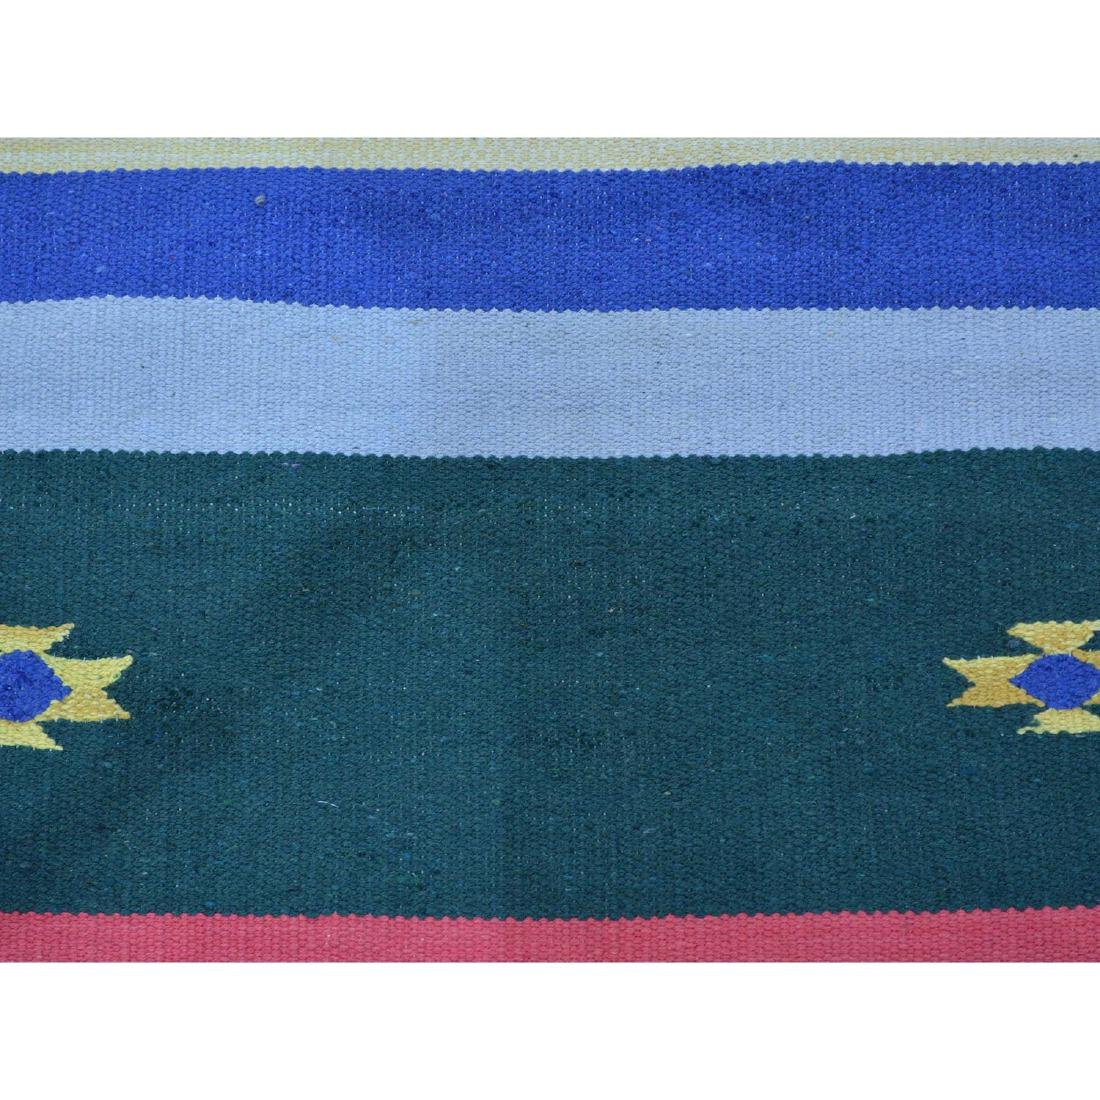 Navajo Design Runner Flat Weave Kilim Hand Woven Rug - 4